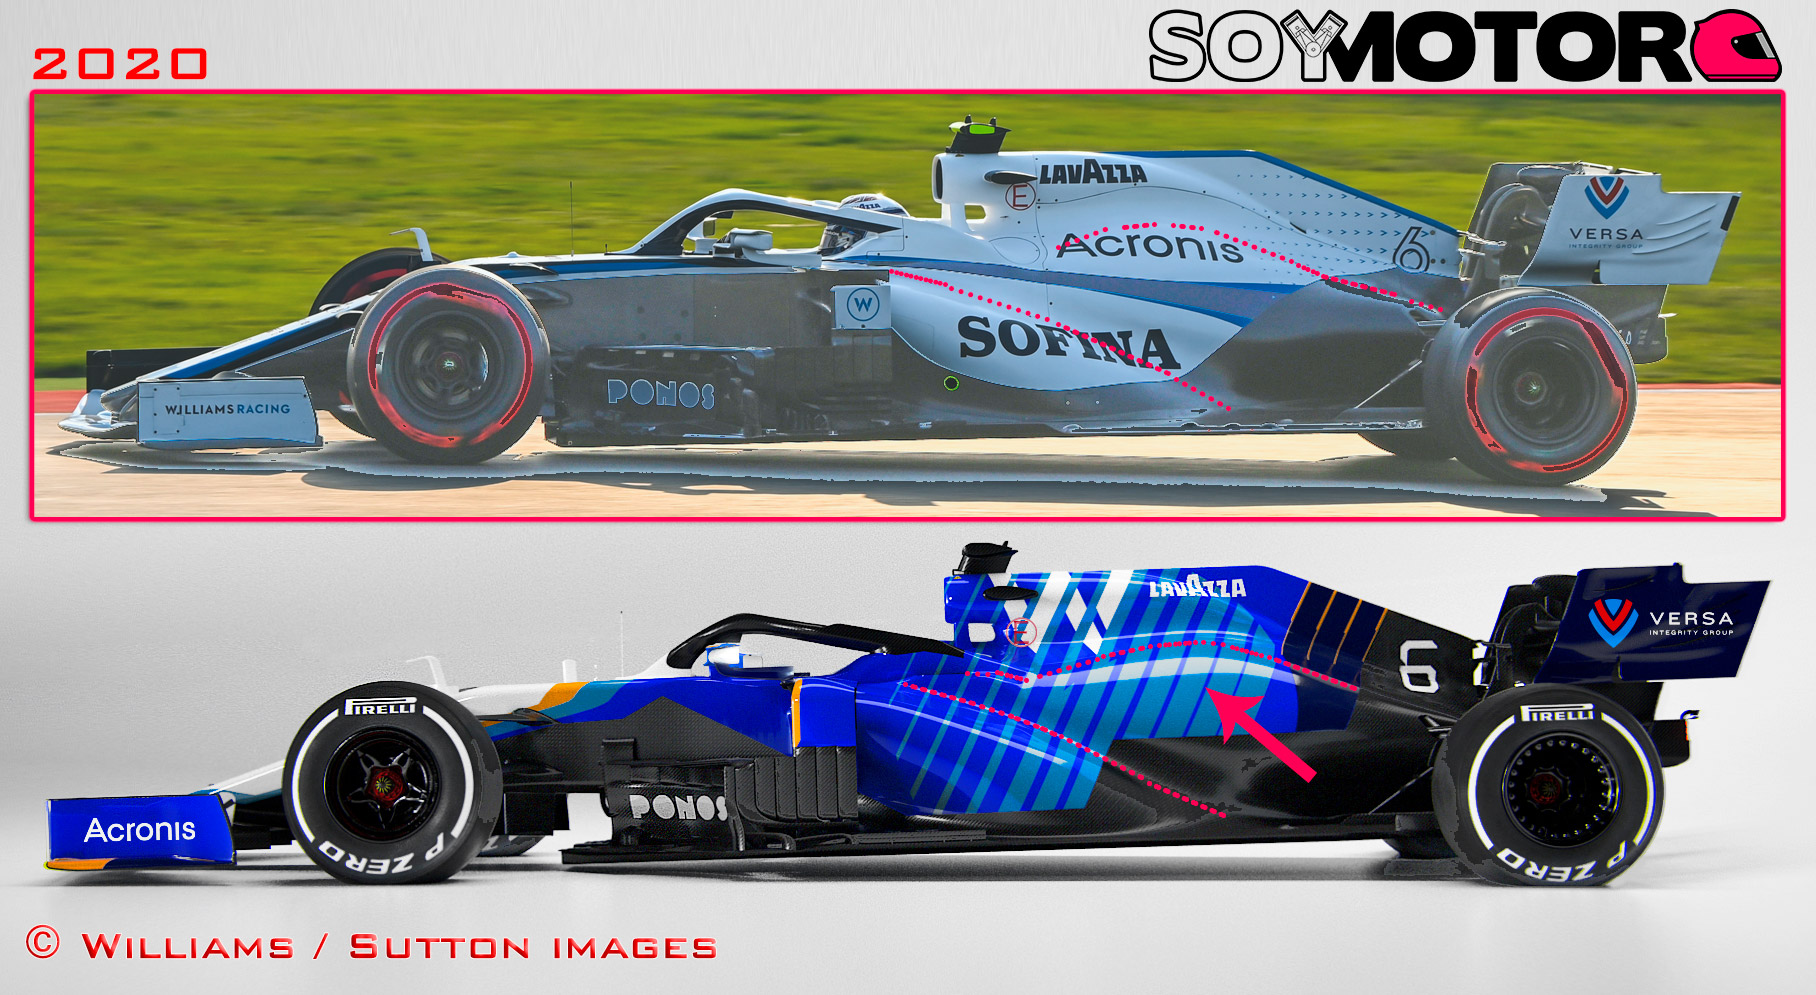 williams-fw43b-lateral-soymotor.jpg